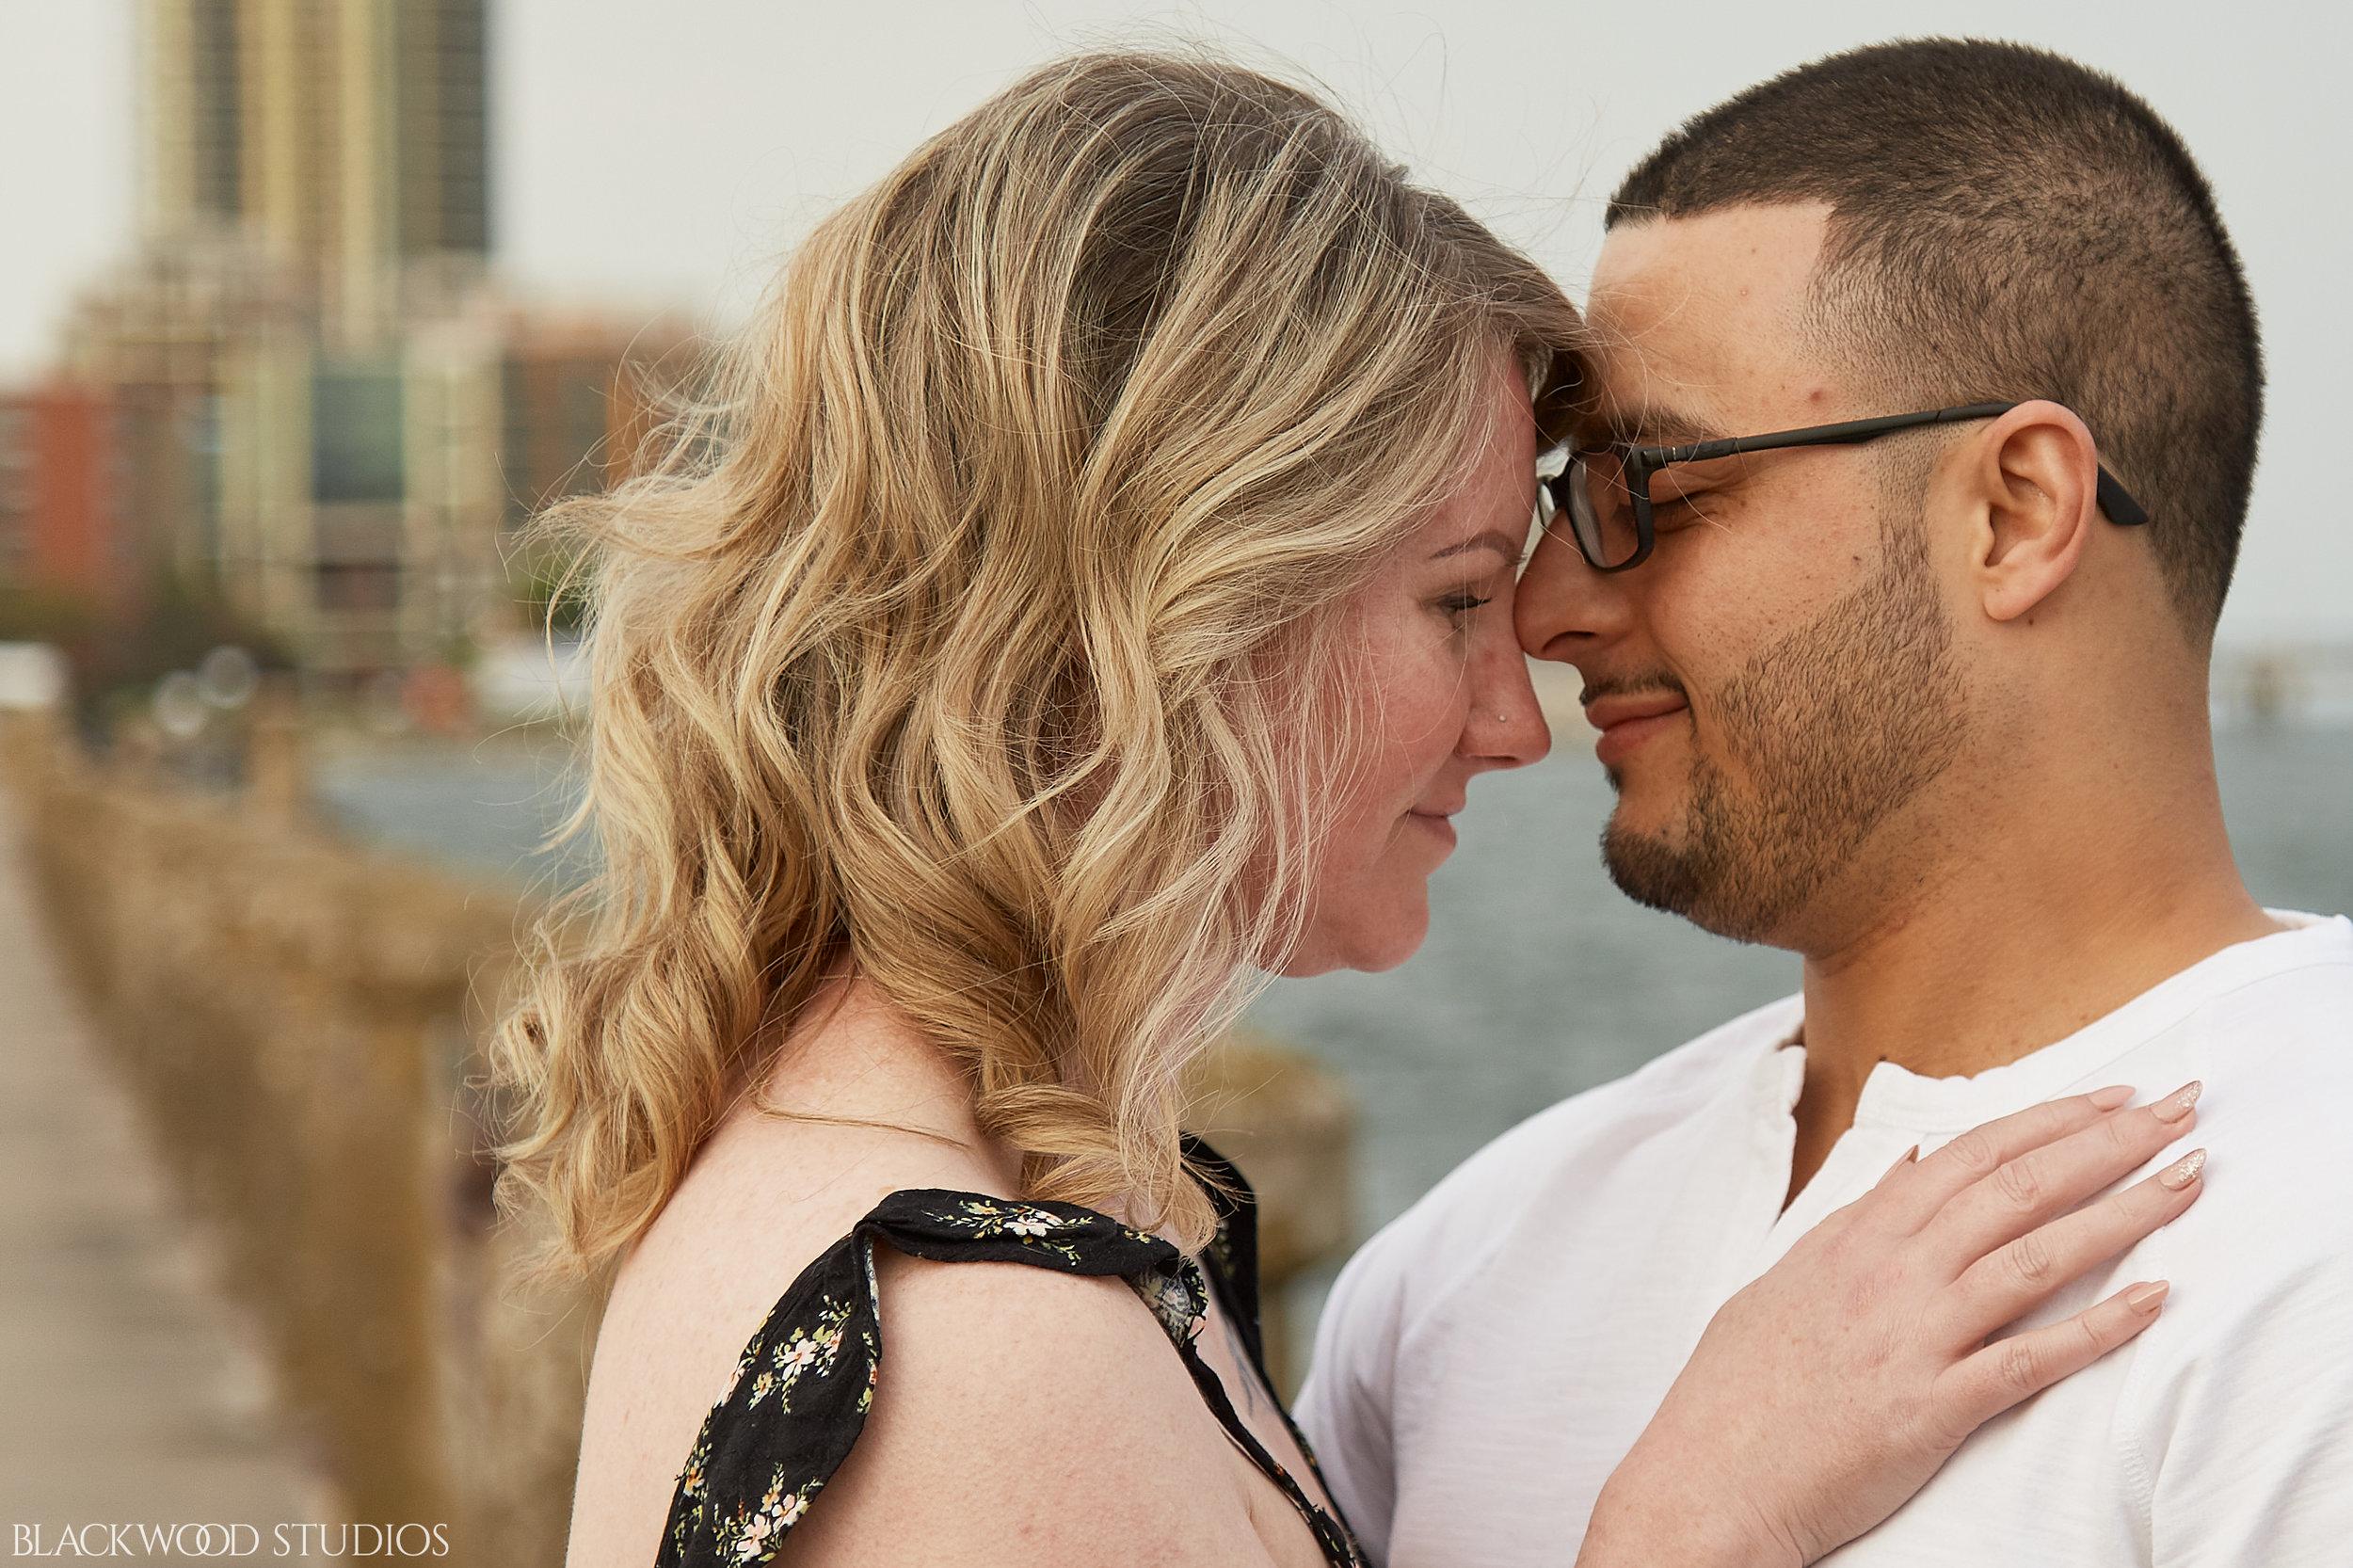 Blackwood-Studios-Photography-20190604194323-Shannon-and-Pedro-Engagement-Spencer-Smith-Park-Burlington-Ontario-Canada.jpg